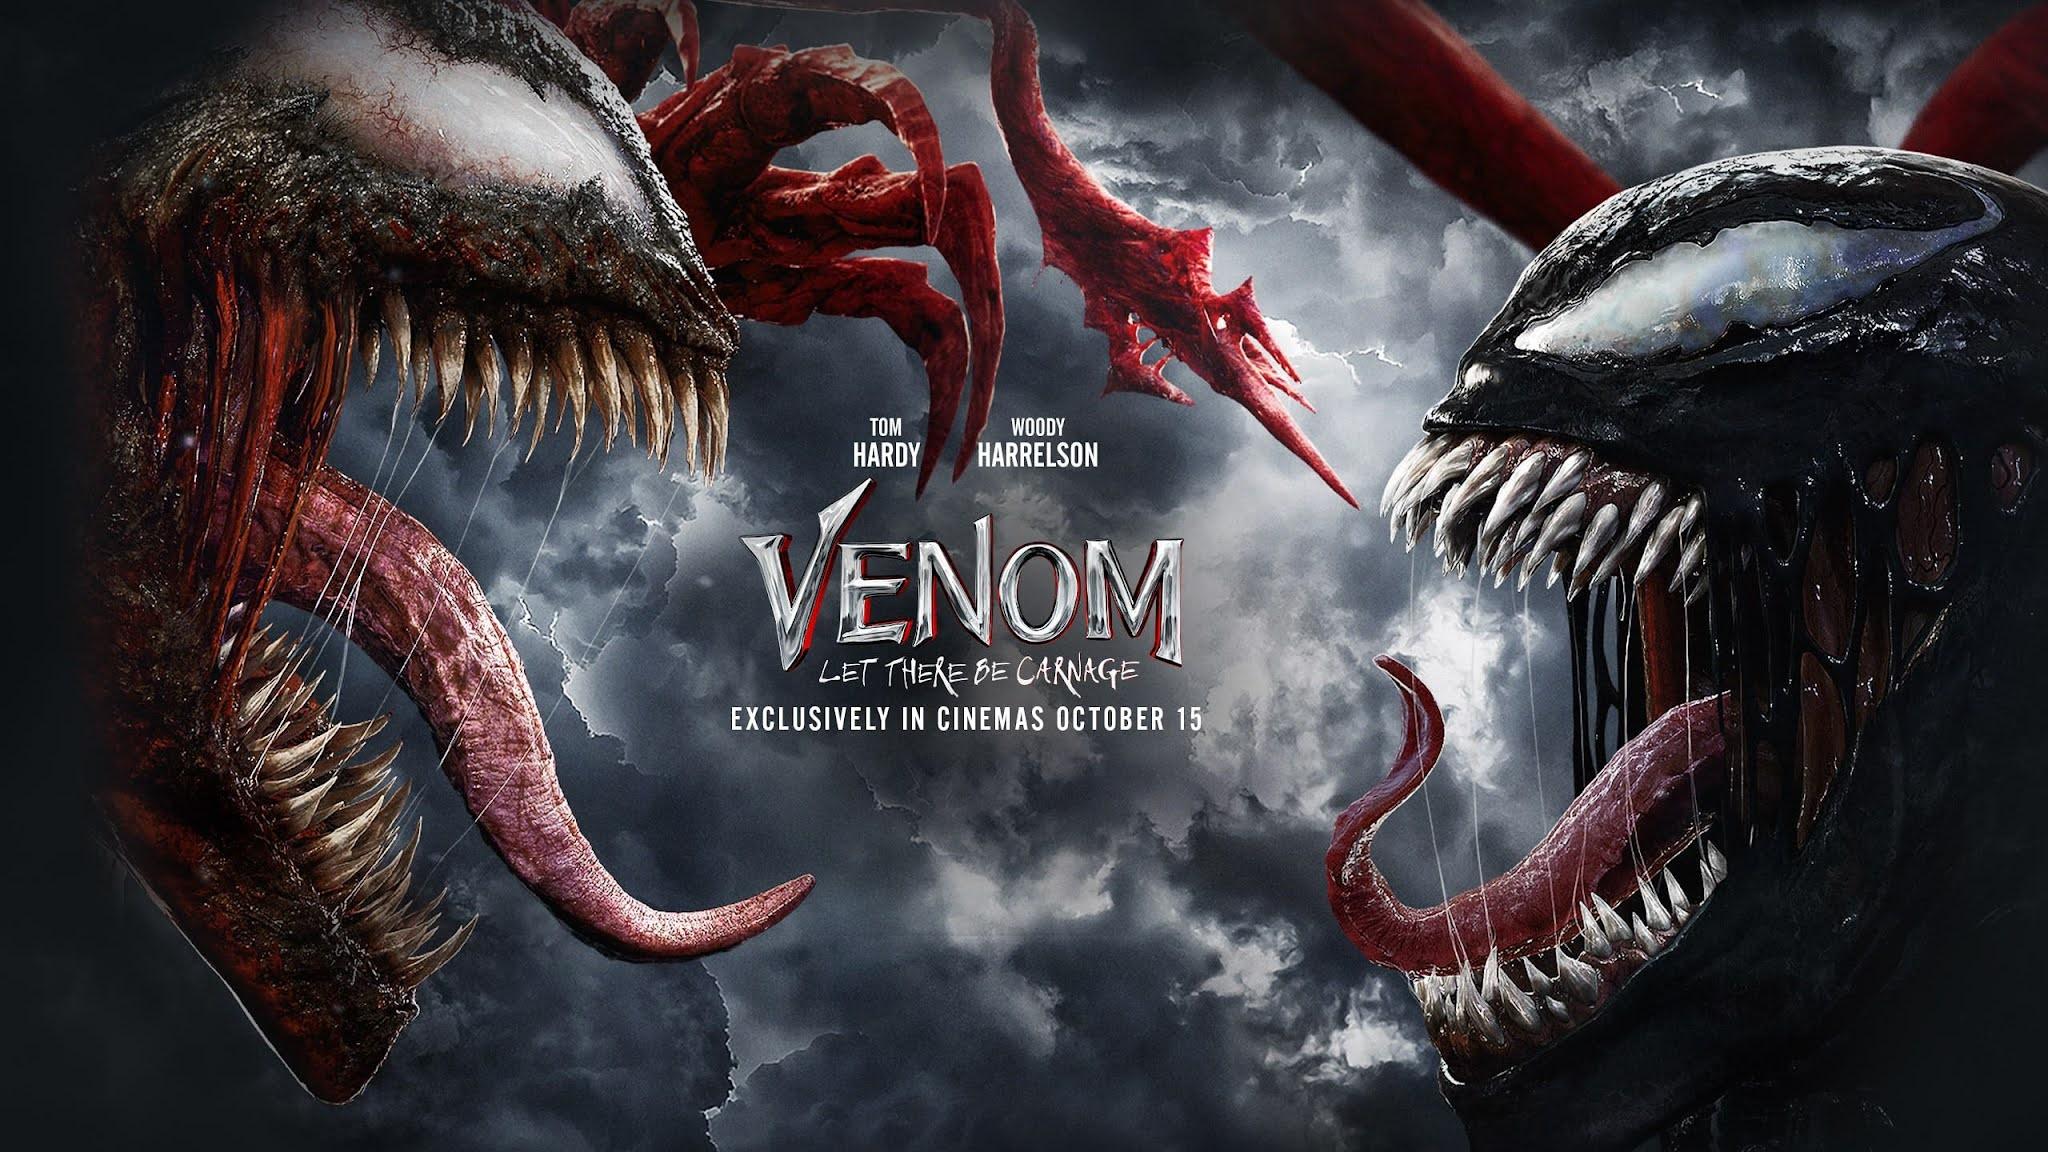 Venom: Let There Be Carnage BoxOffice, Venom 2 boxoffice